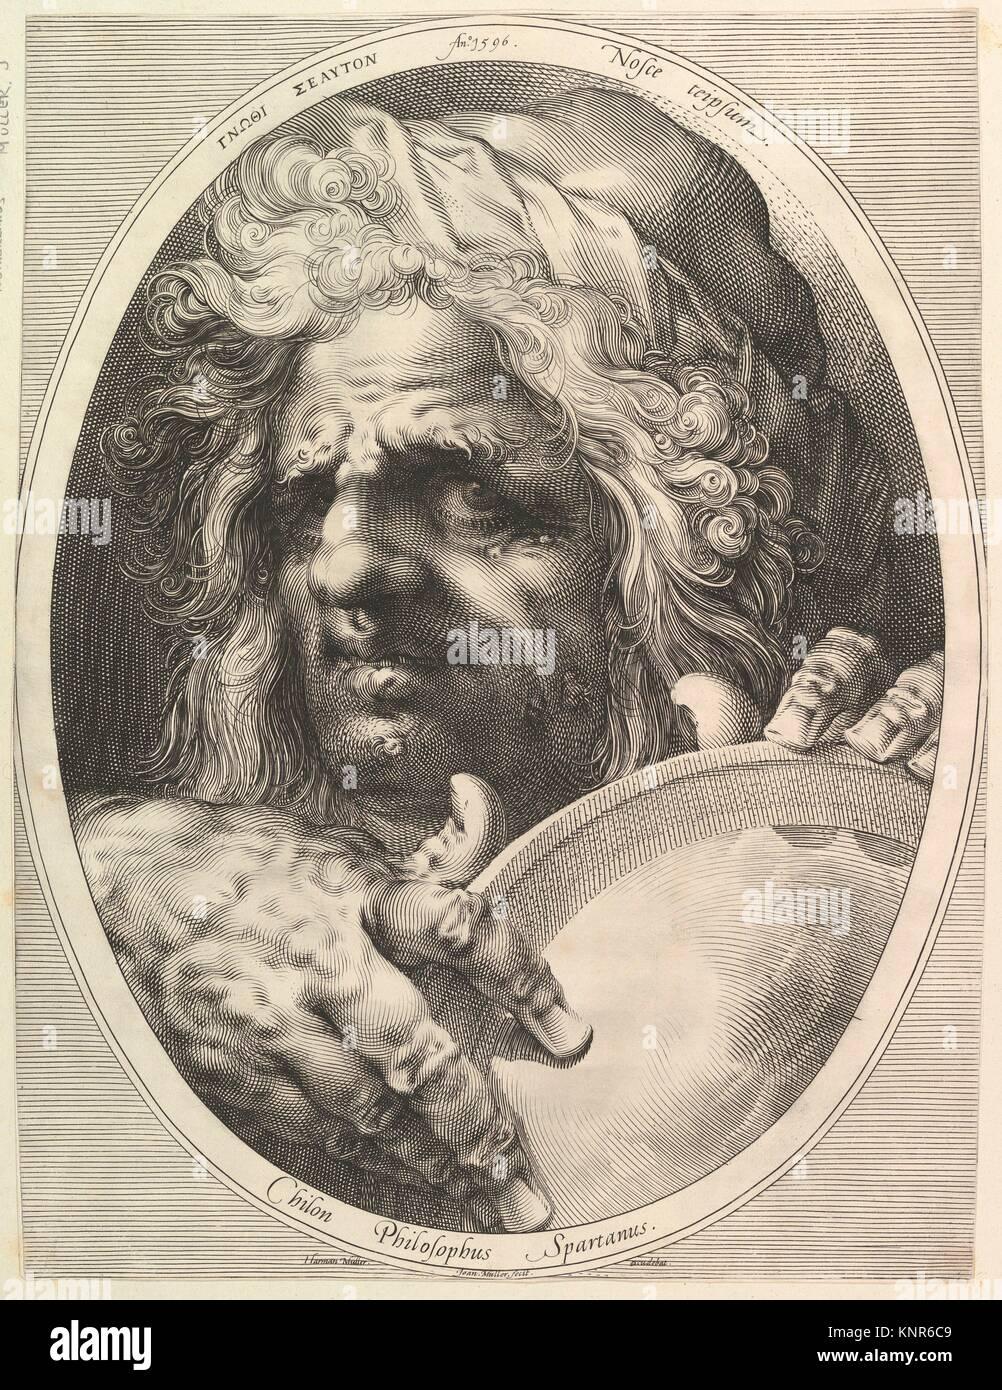 Chilon, Legislator & Philosopher of Sparta. Artist: Jan Muller (Netherlandish, Amsterdam 1571-1628 Amsterdam); - Stock Image